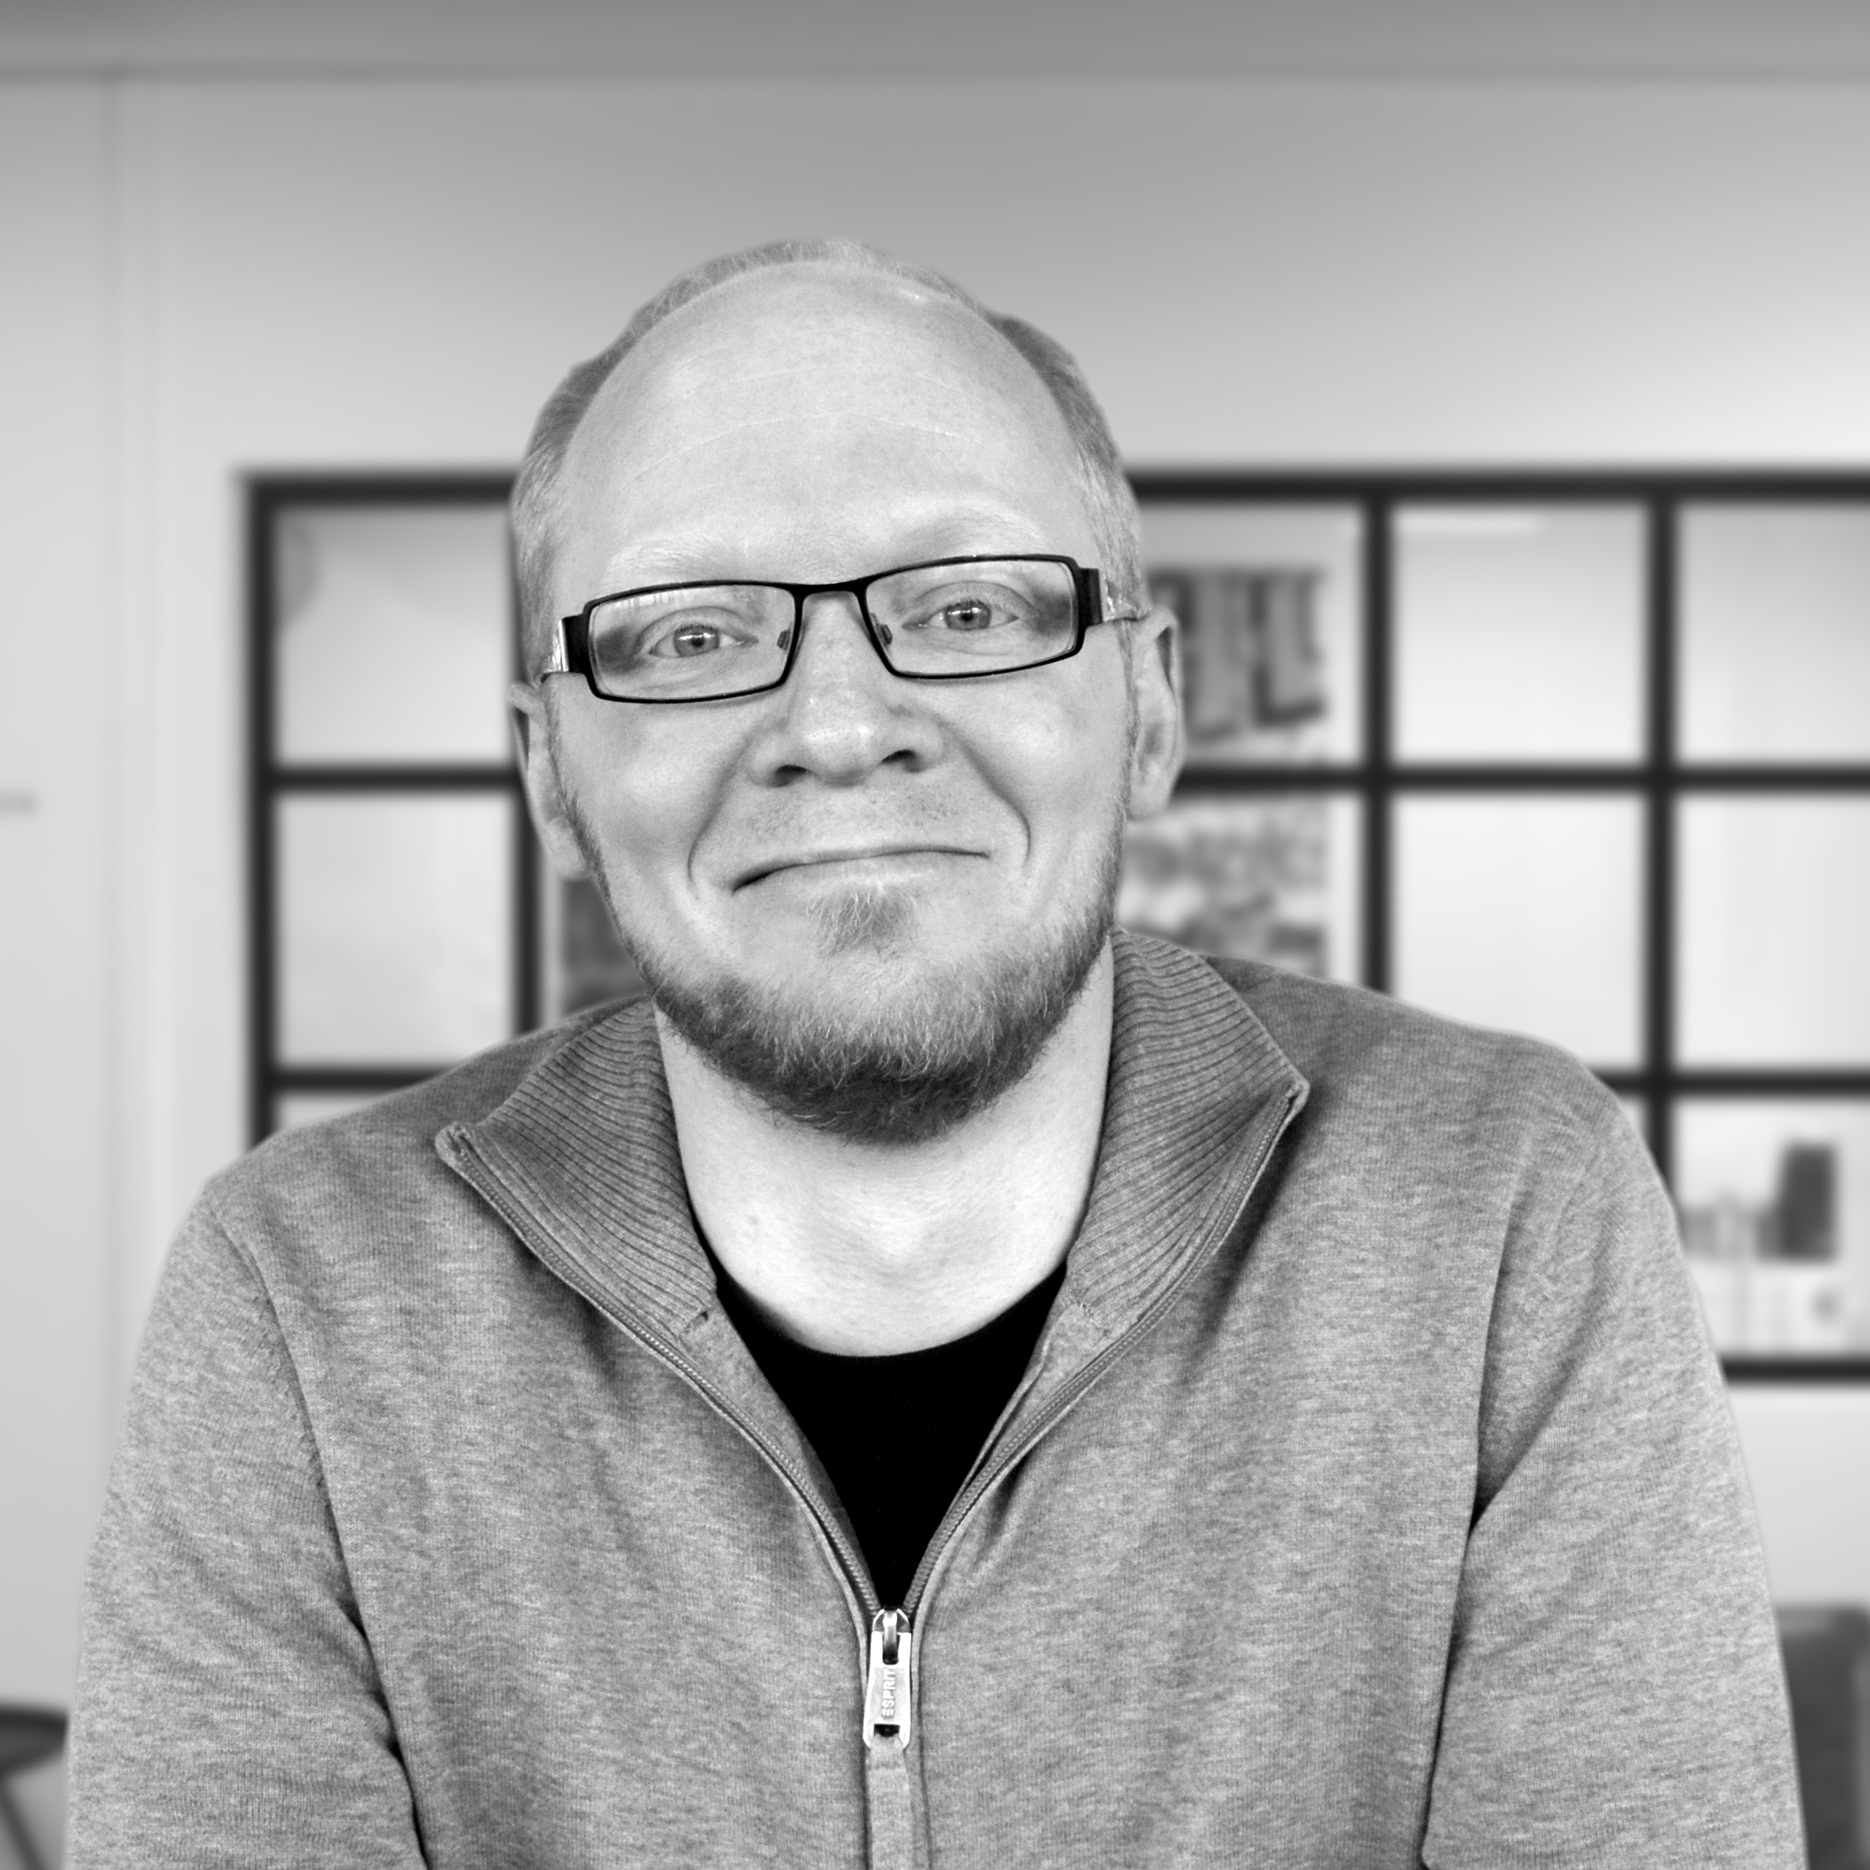 http://horisontgruppen.dk/wp-content/uploads/ANDERS_2019.jpg